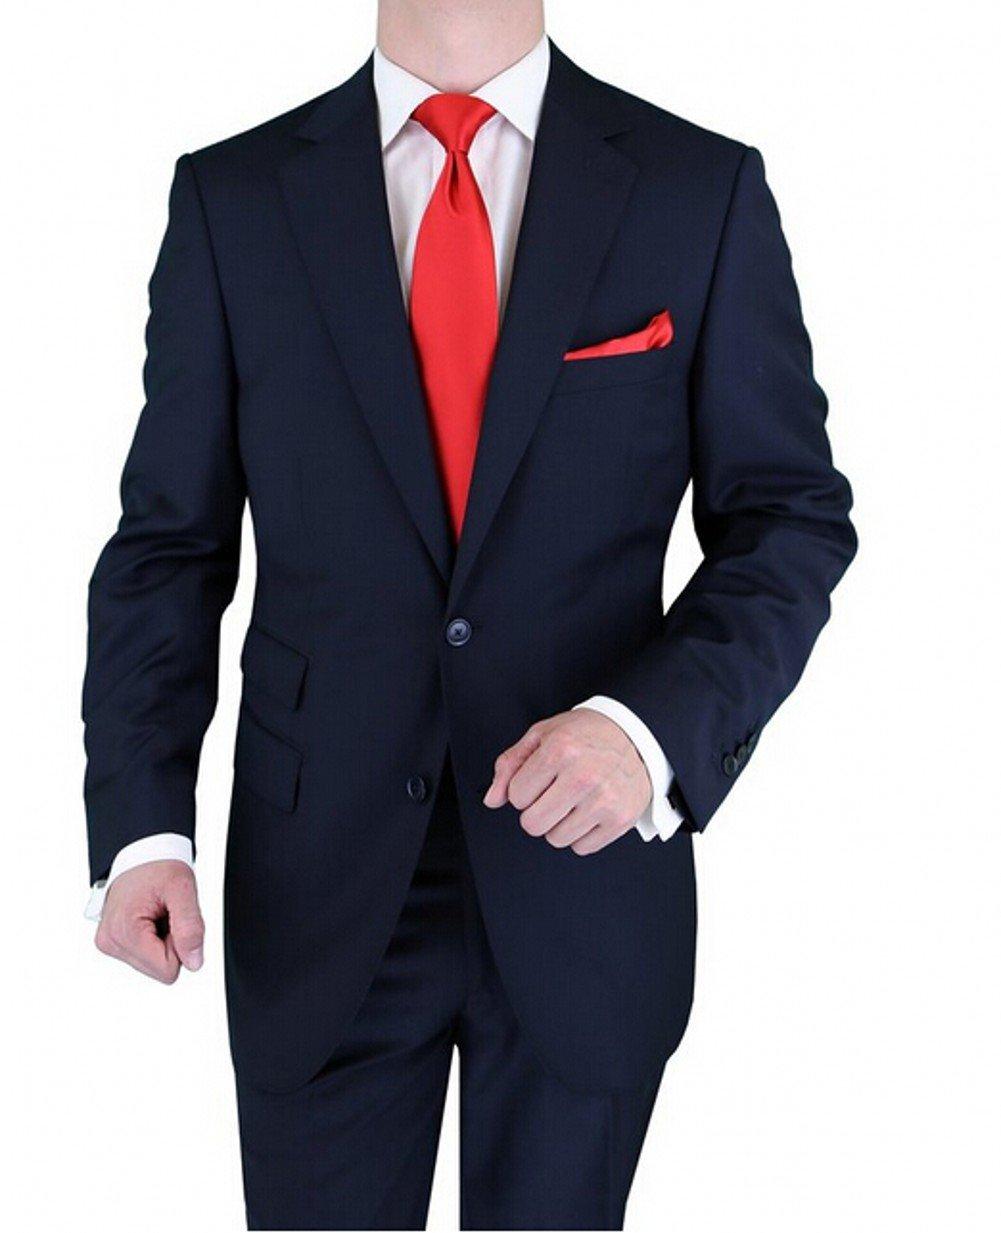 Love Dress Men's Two-Button Suit Tuxedo Wedding Dress Navy 5XL